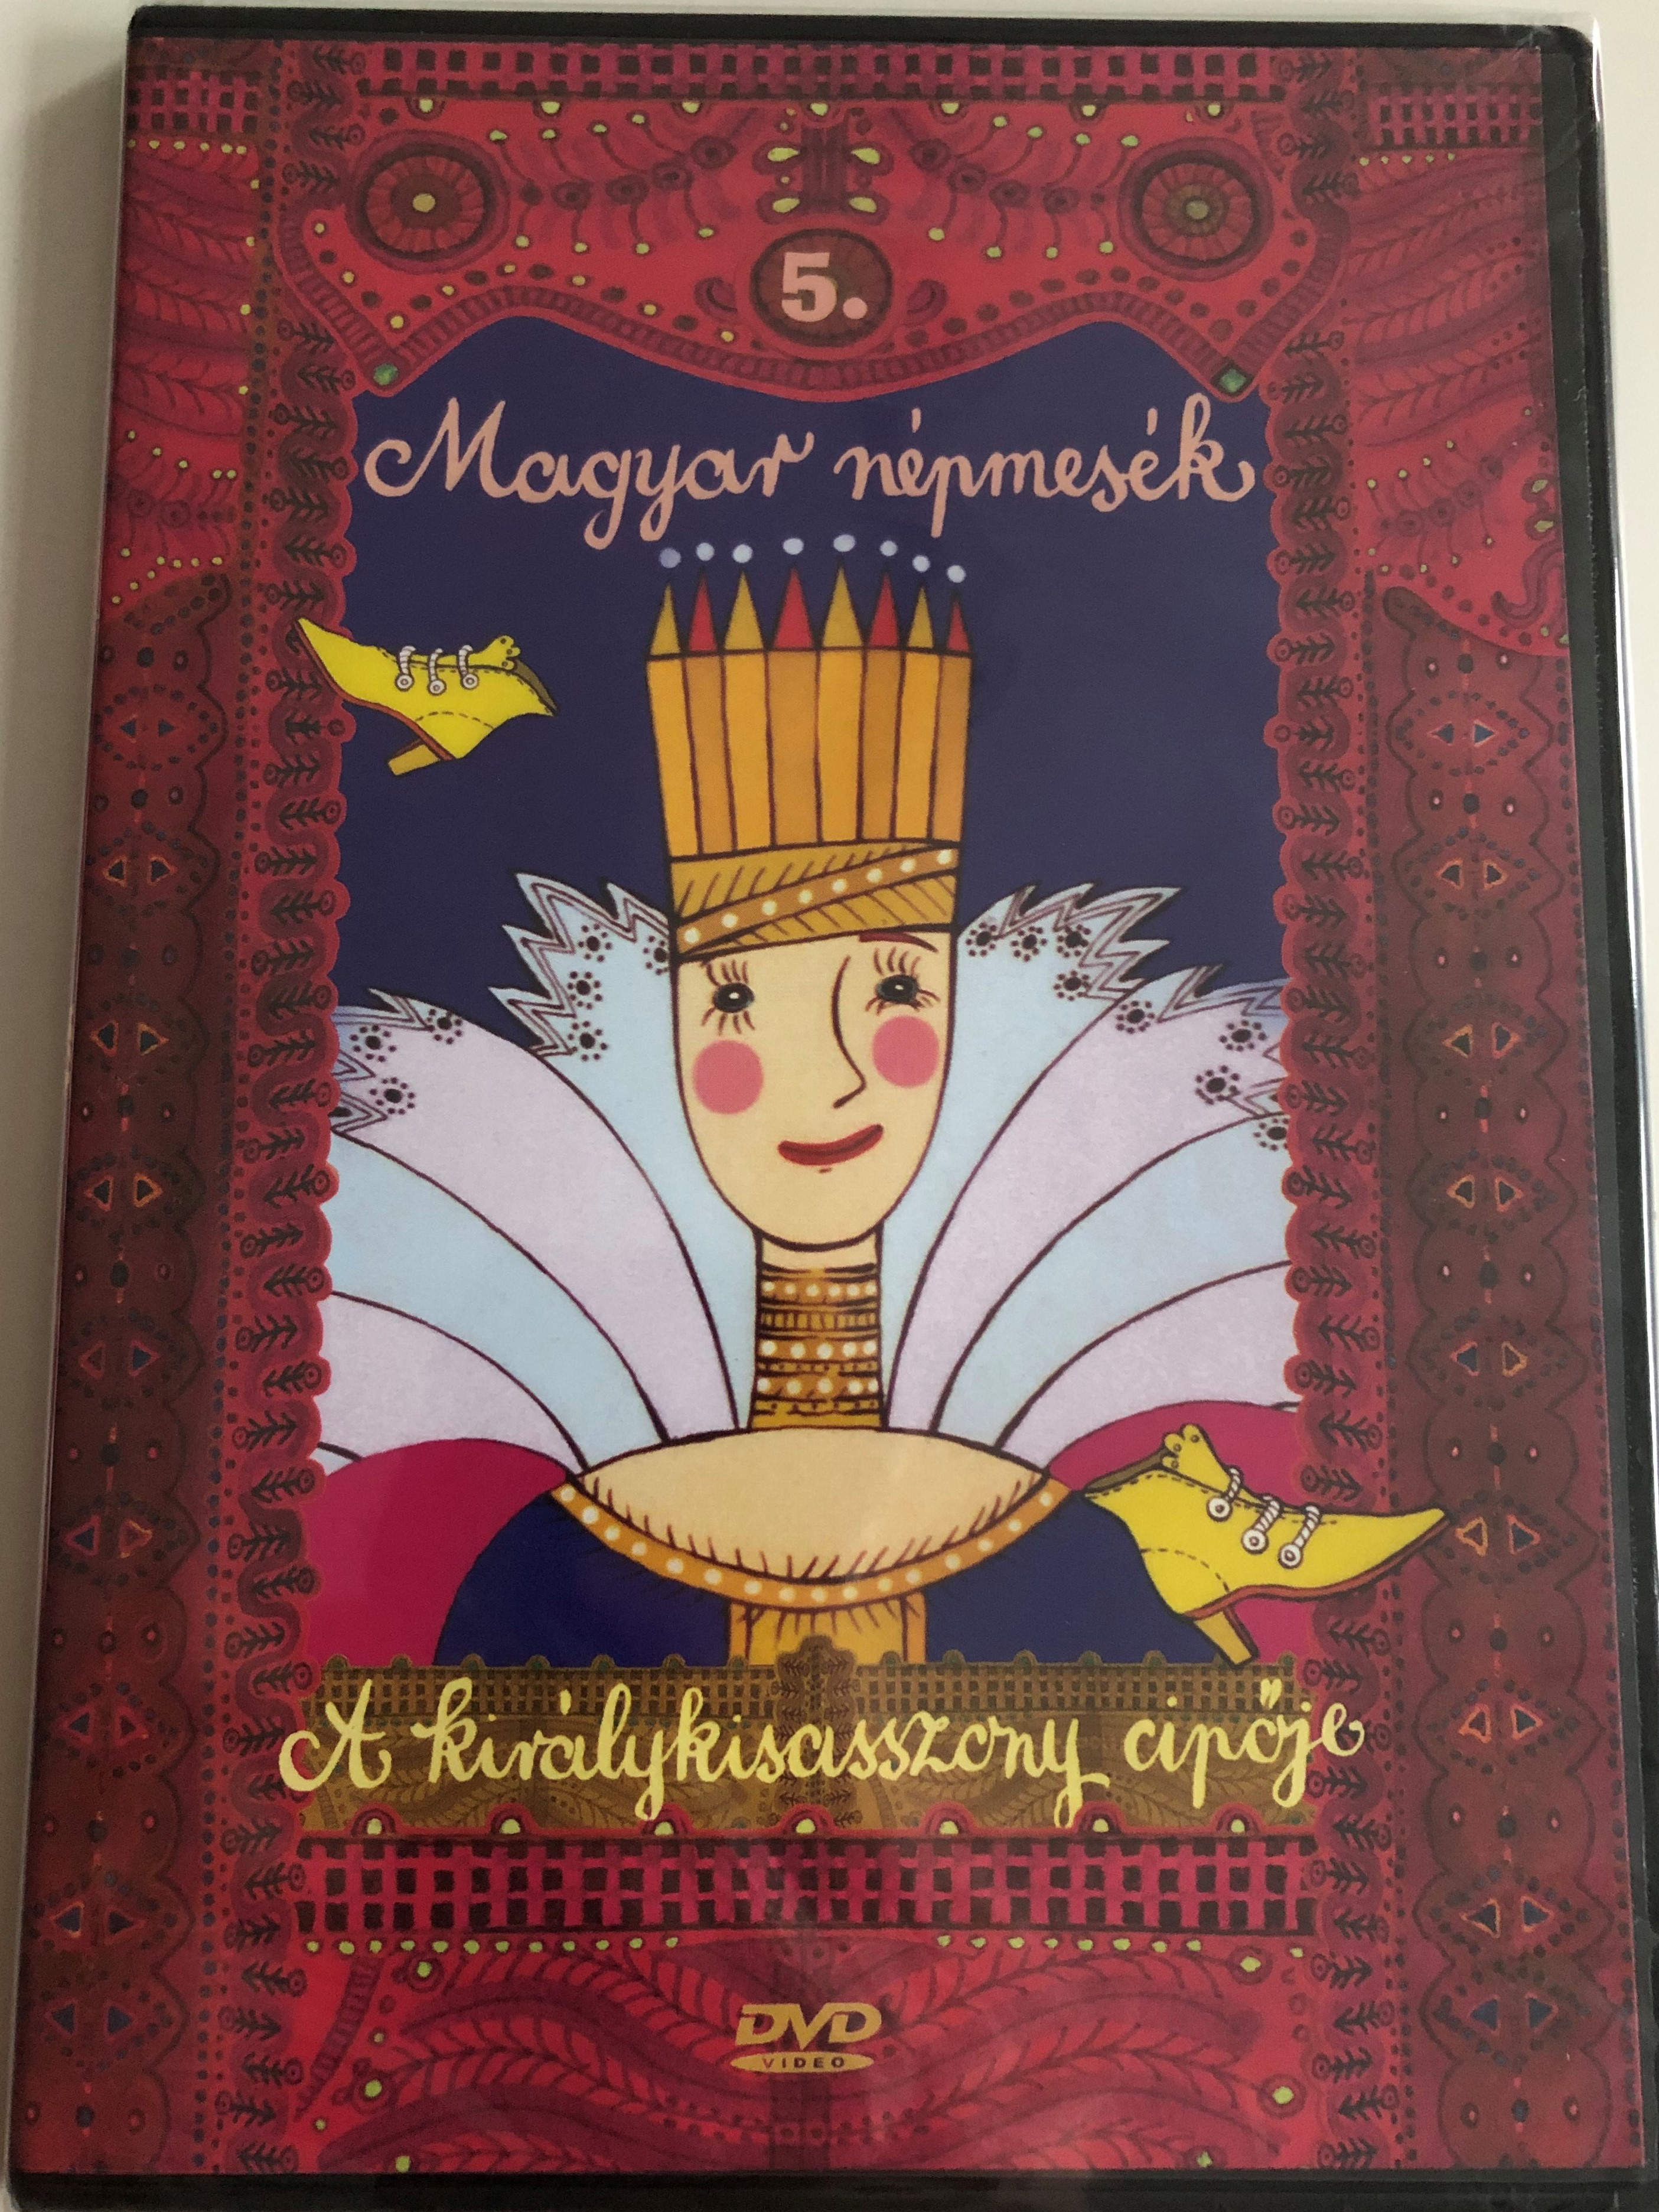 magyar-n-pmes-k-5.-a-kir-lykisasszony-cip-je-dvd-1995-1996-hungarian-folk-tales-for-children-1-.jpg